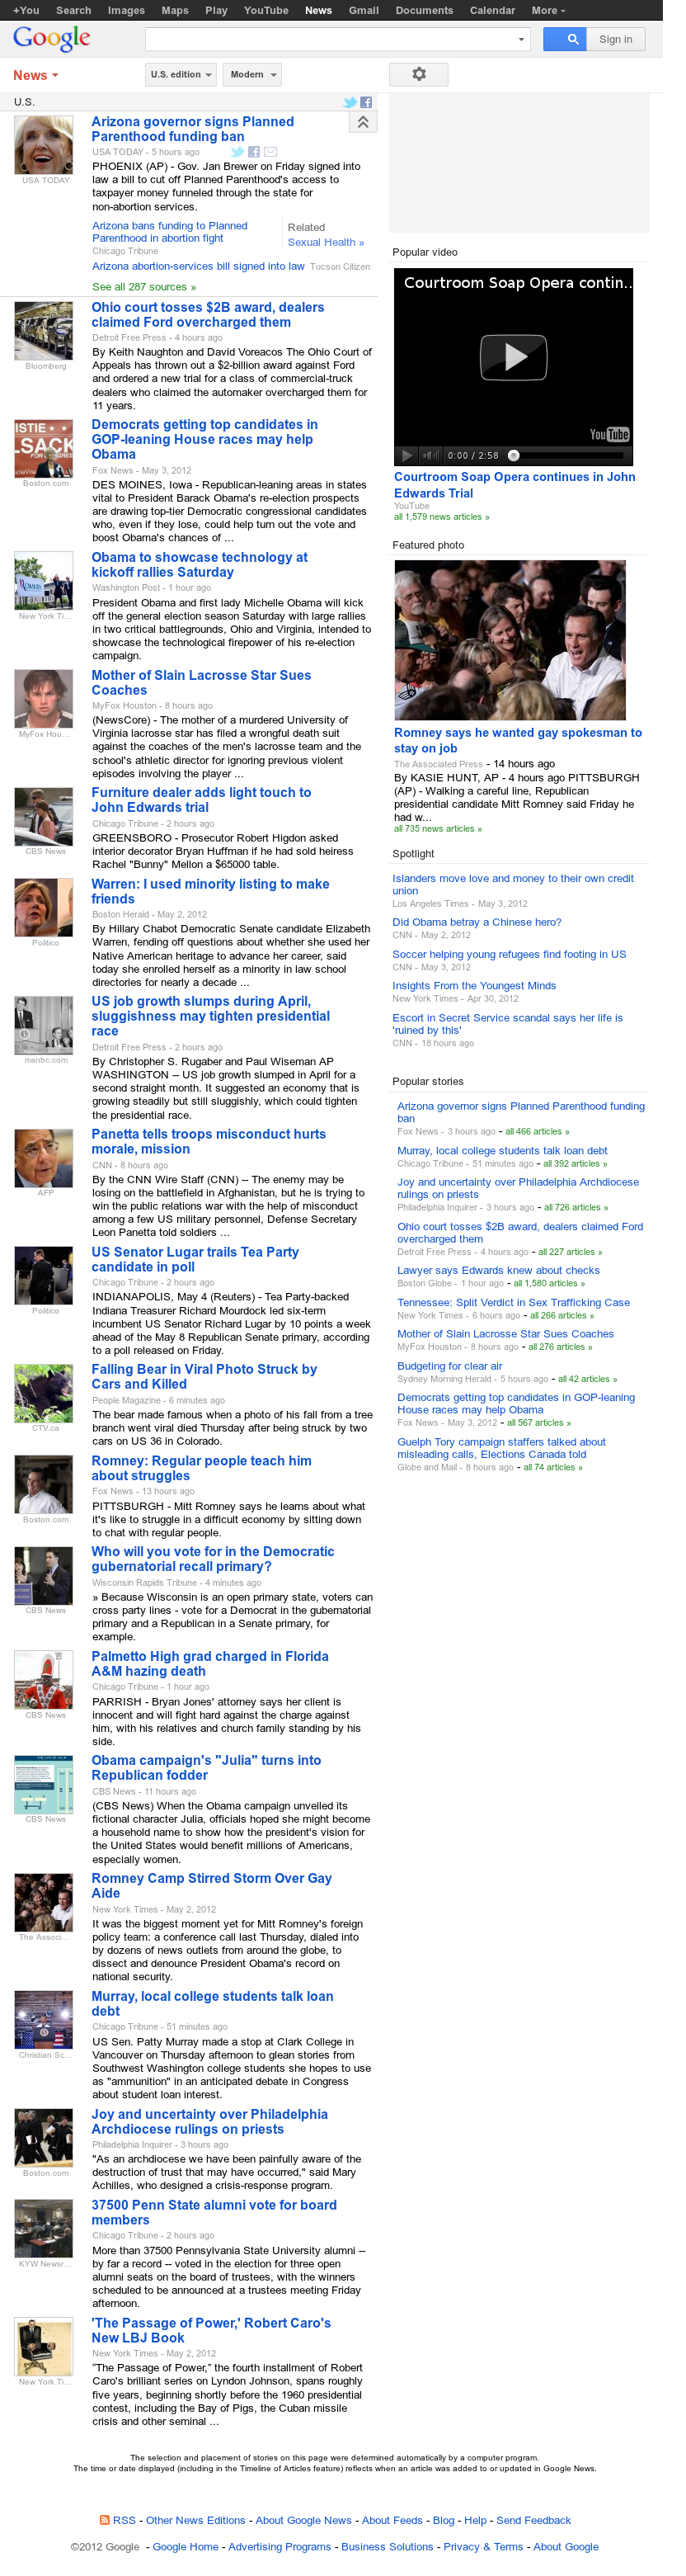 Google News: U.S. at Saturday May 5, 2012, 10:06 a.m. UTC